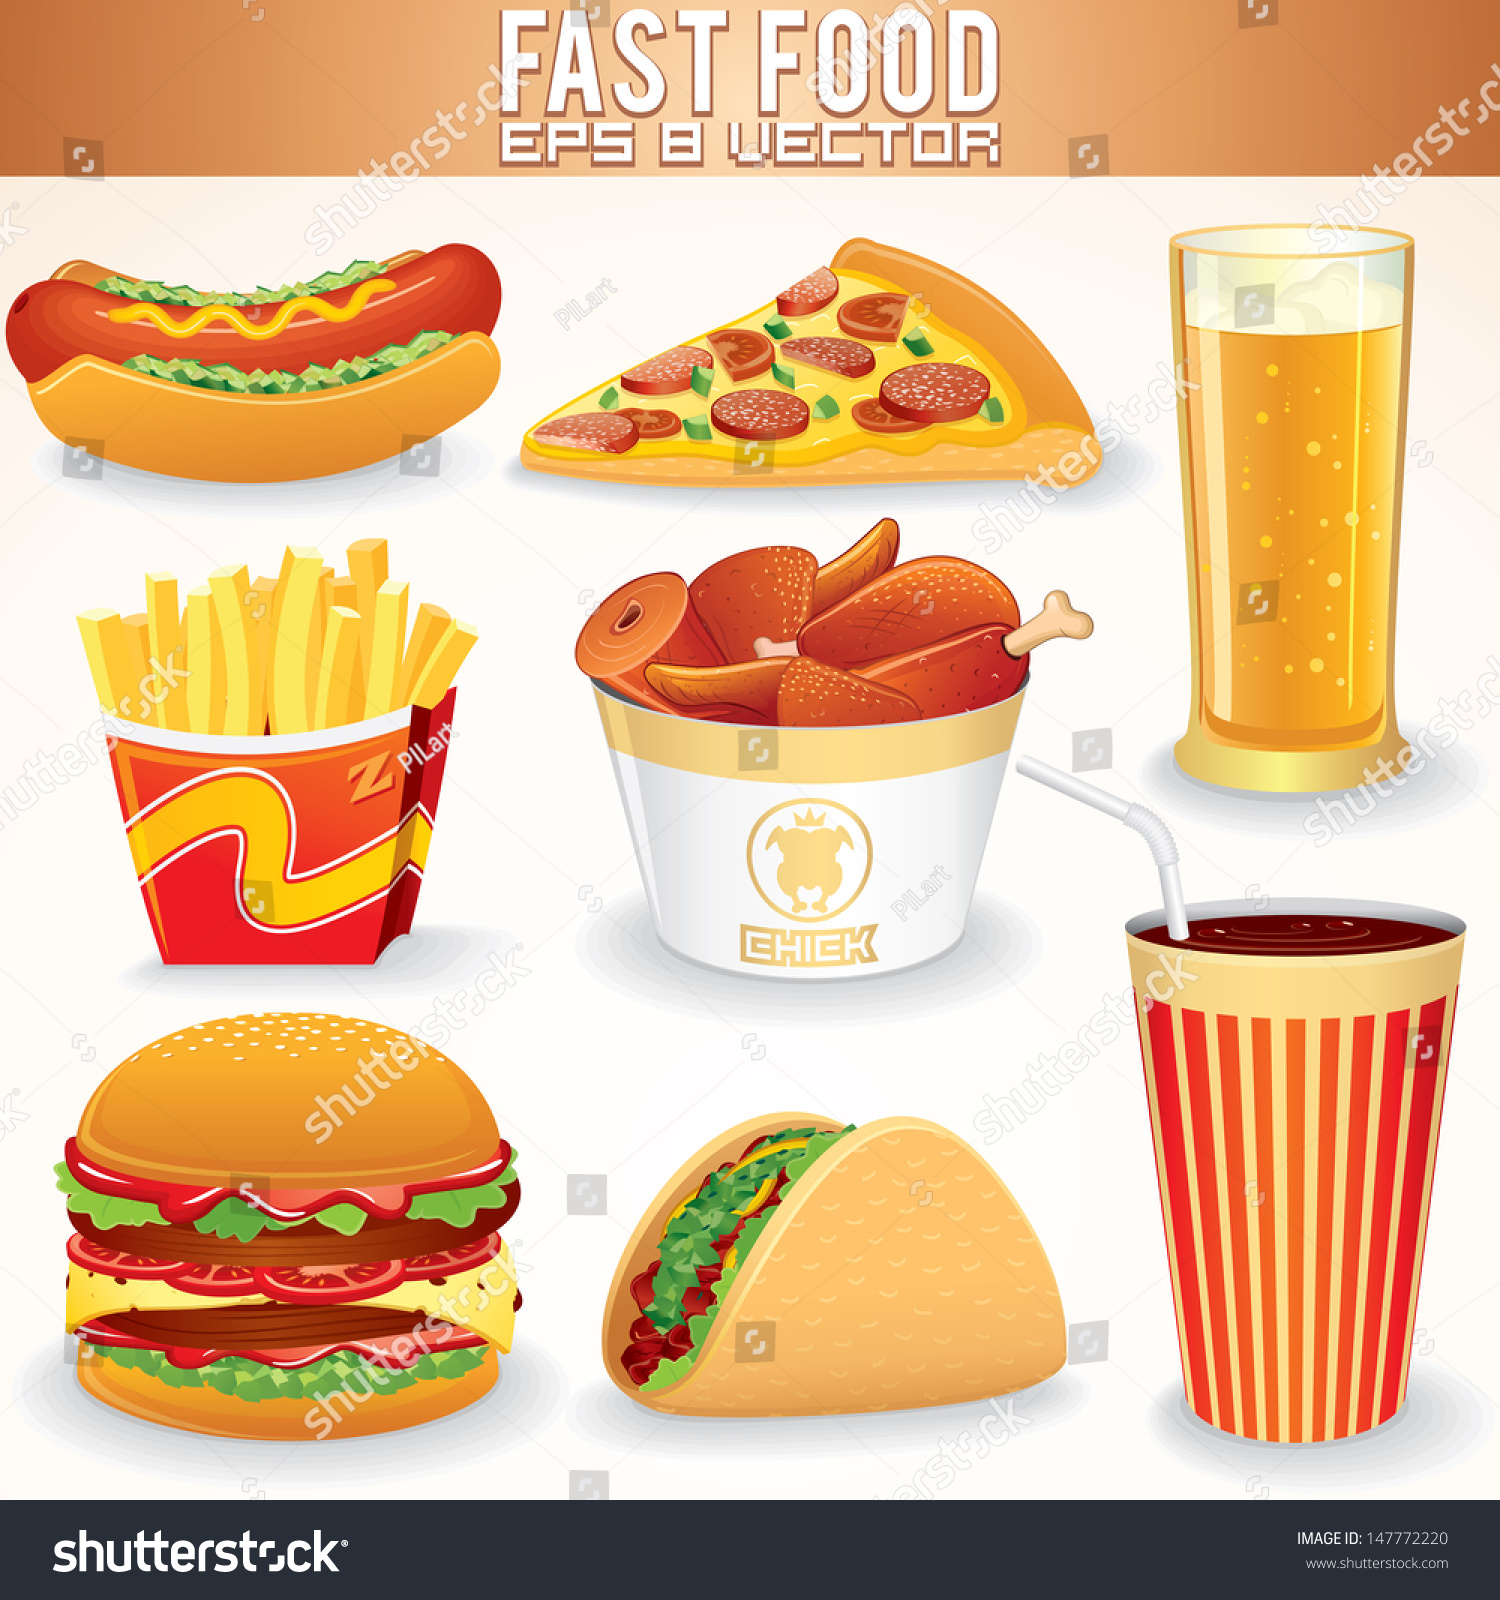 Hot Dog Vs Hamburger Fat